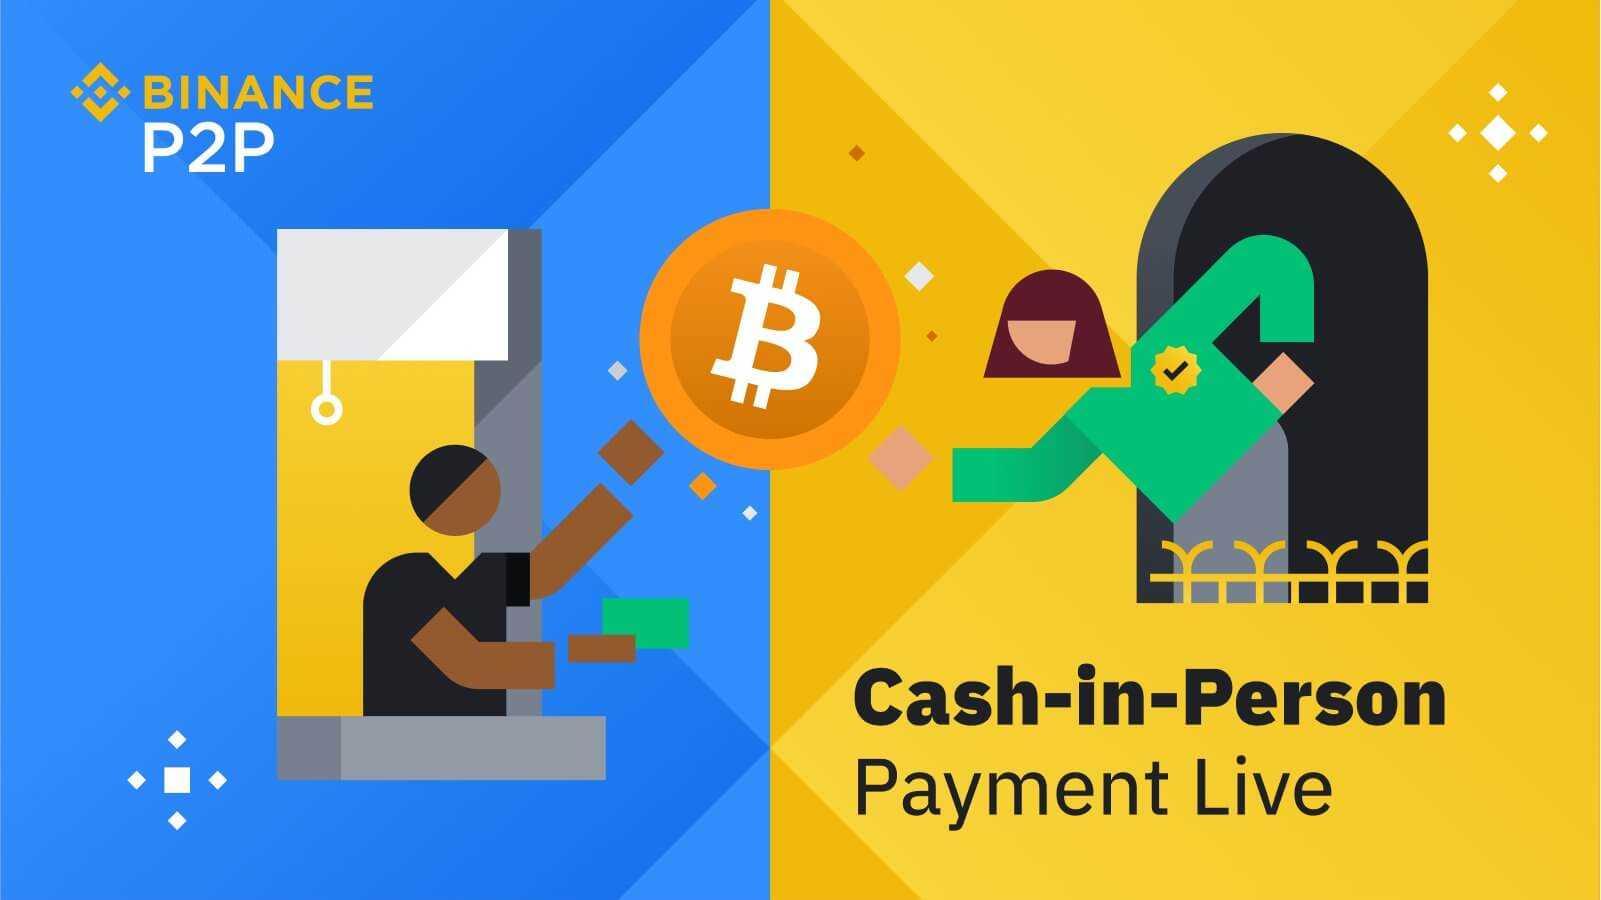 Binance Cash-in-Person